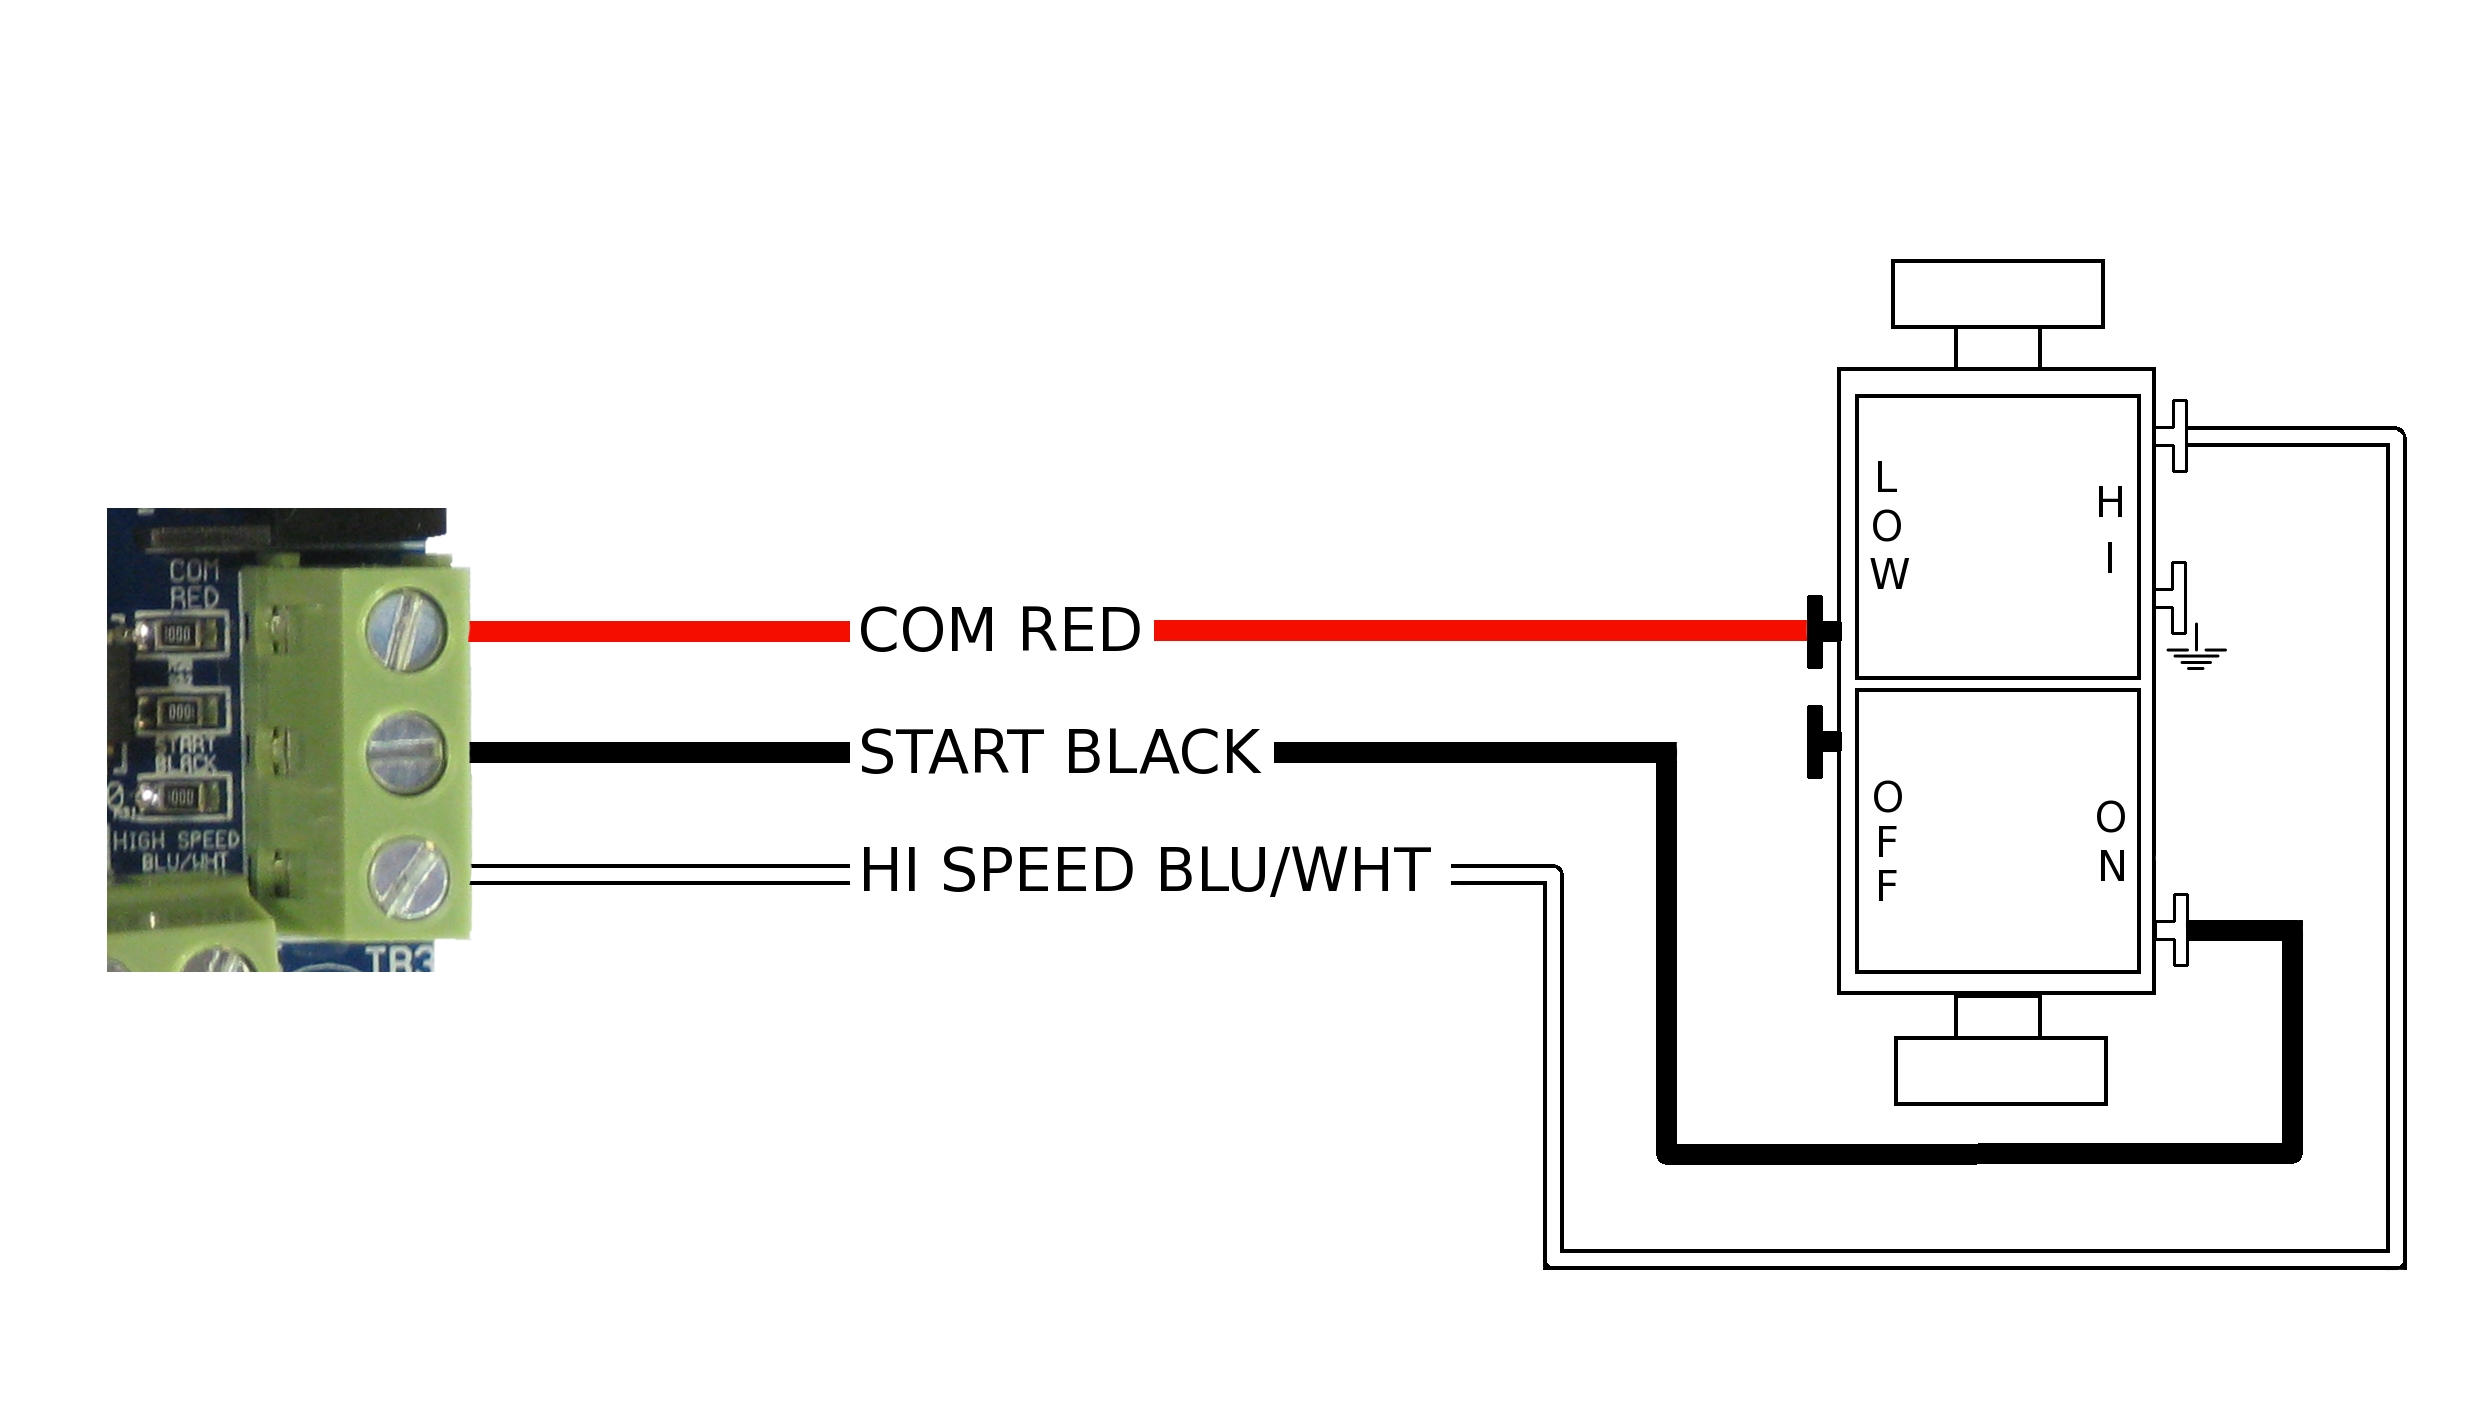 Attic Fan Switch Wiring Diagram Free Download | Manual E-Books - 2 Speed Whole House Fan Switch Wiring Diagram